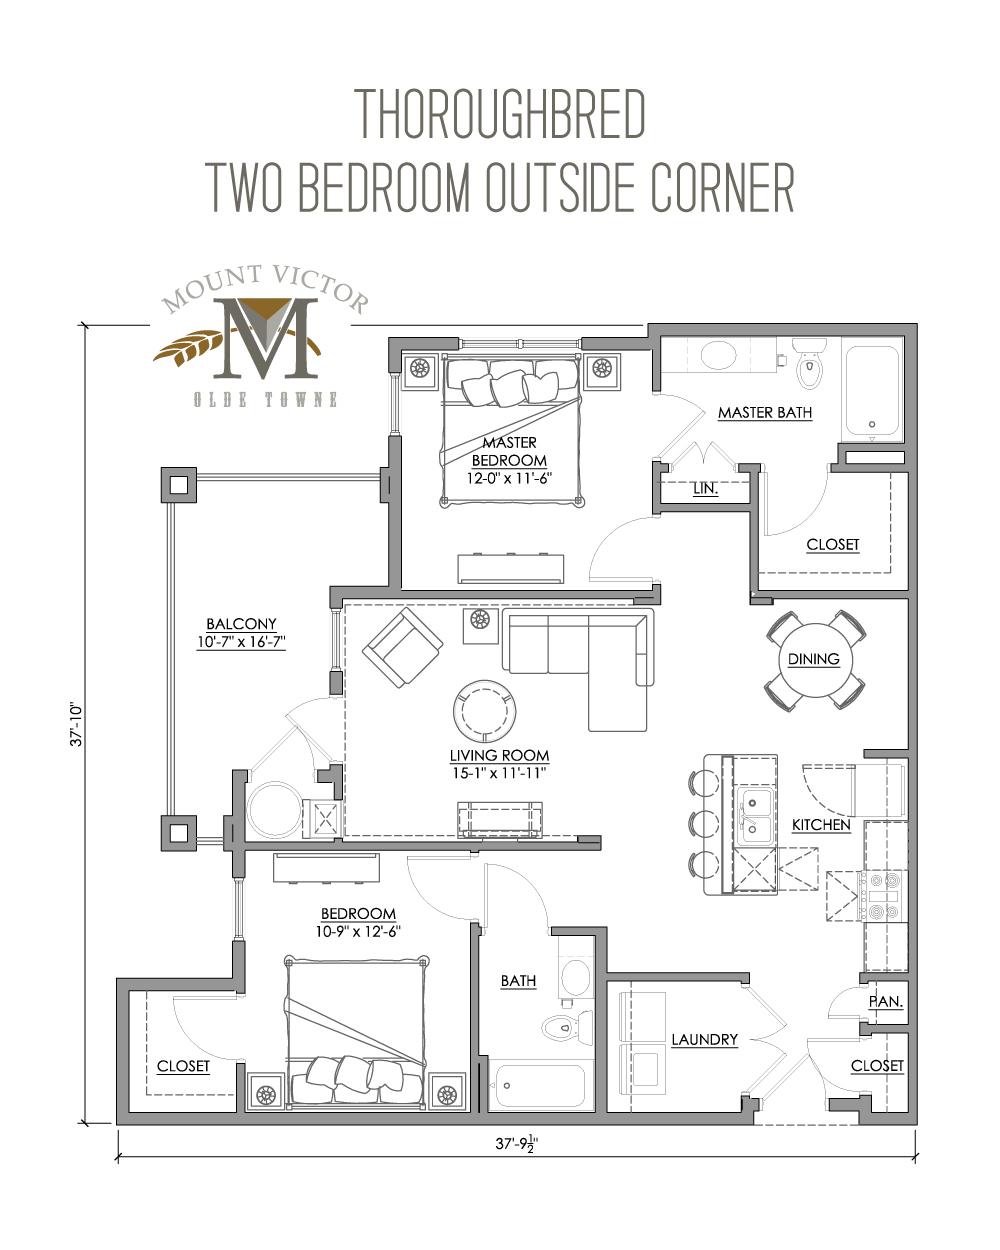 two bedroom outside corner